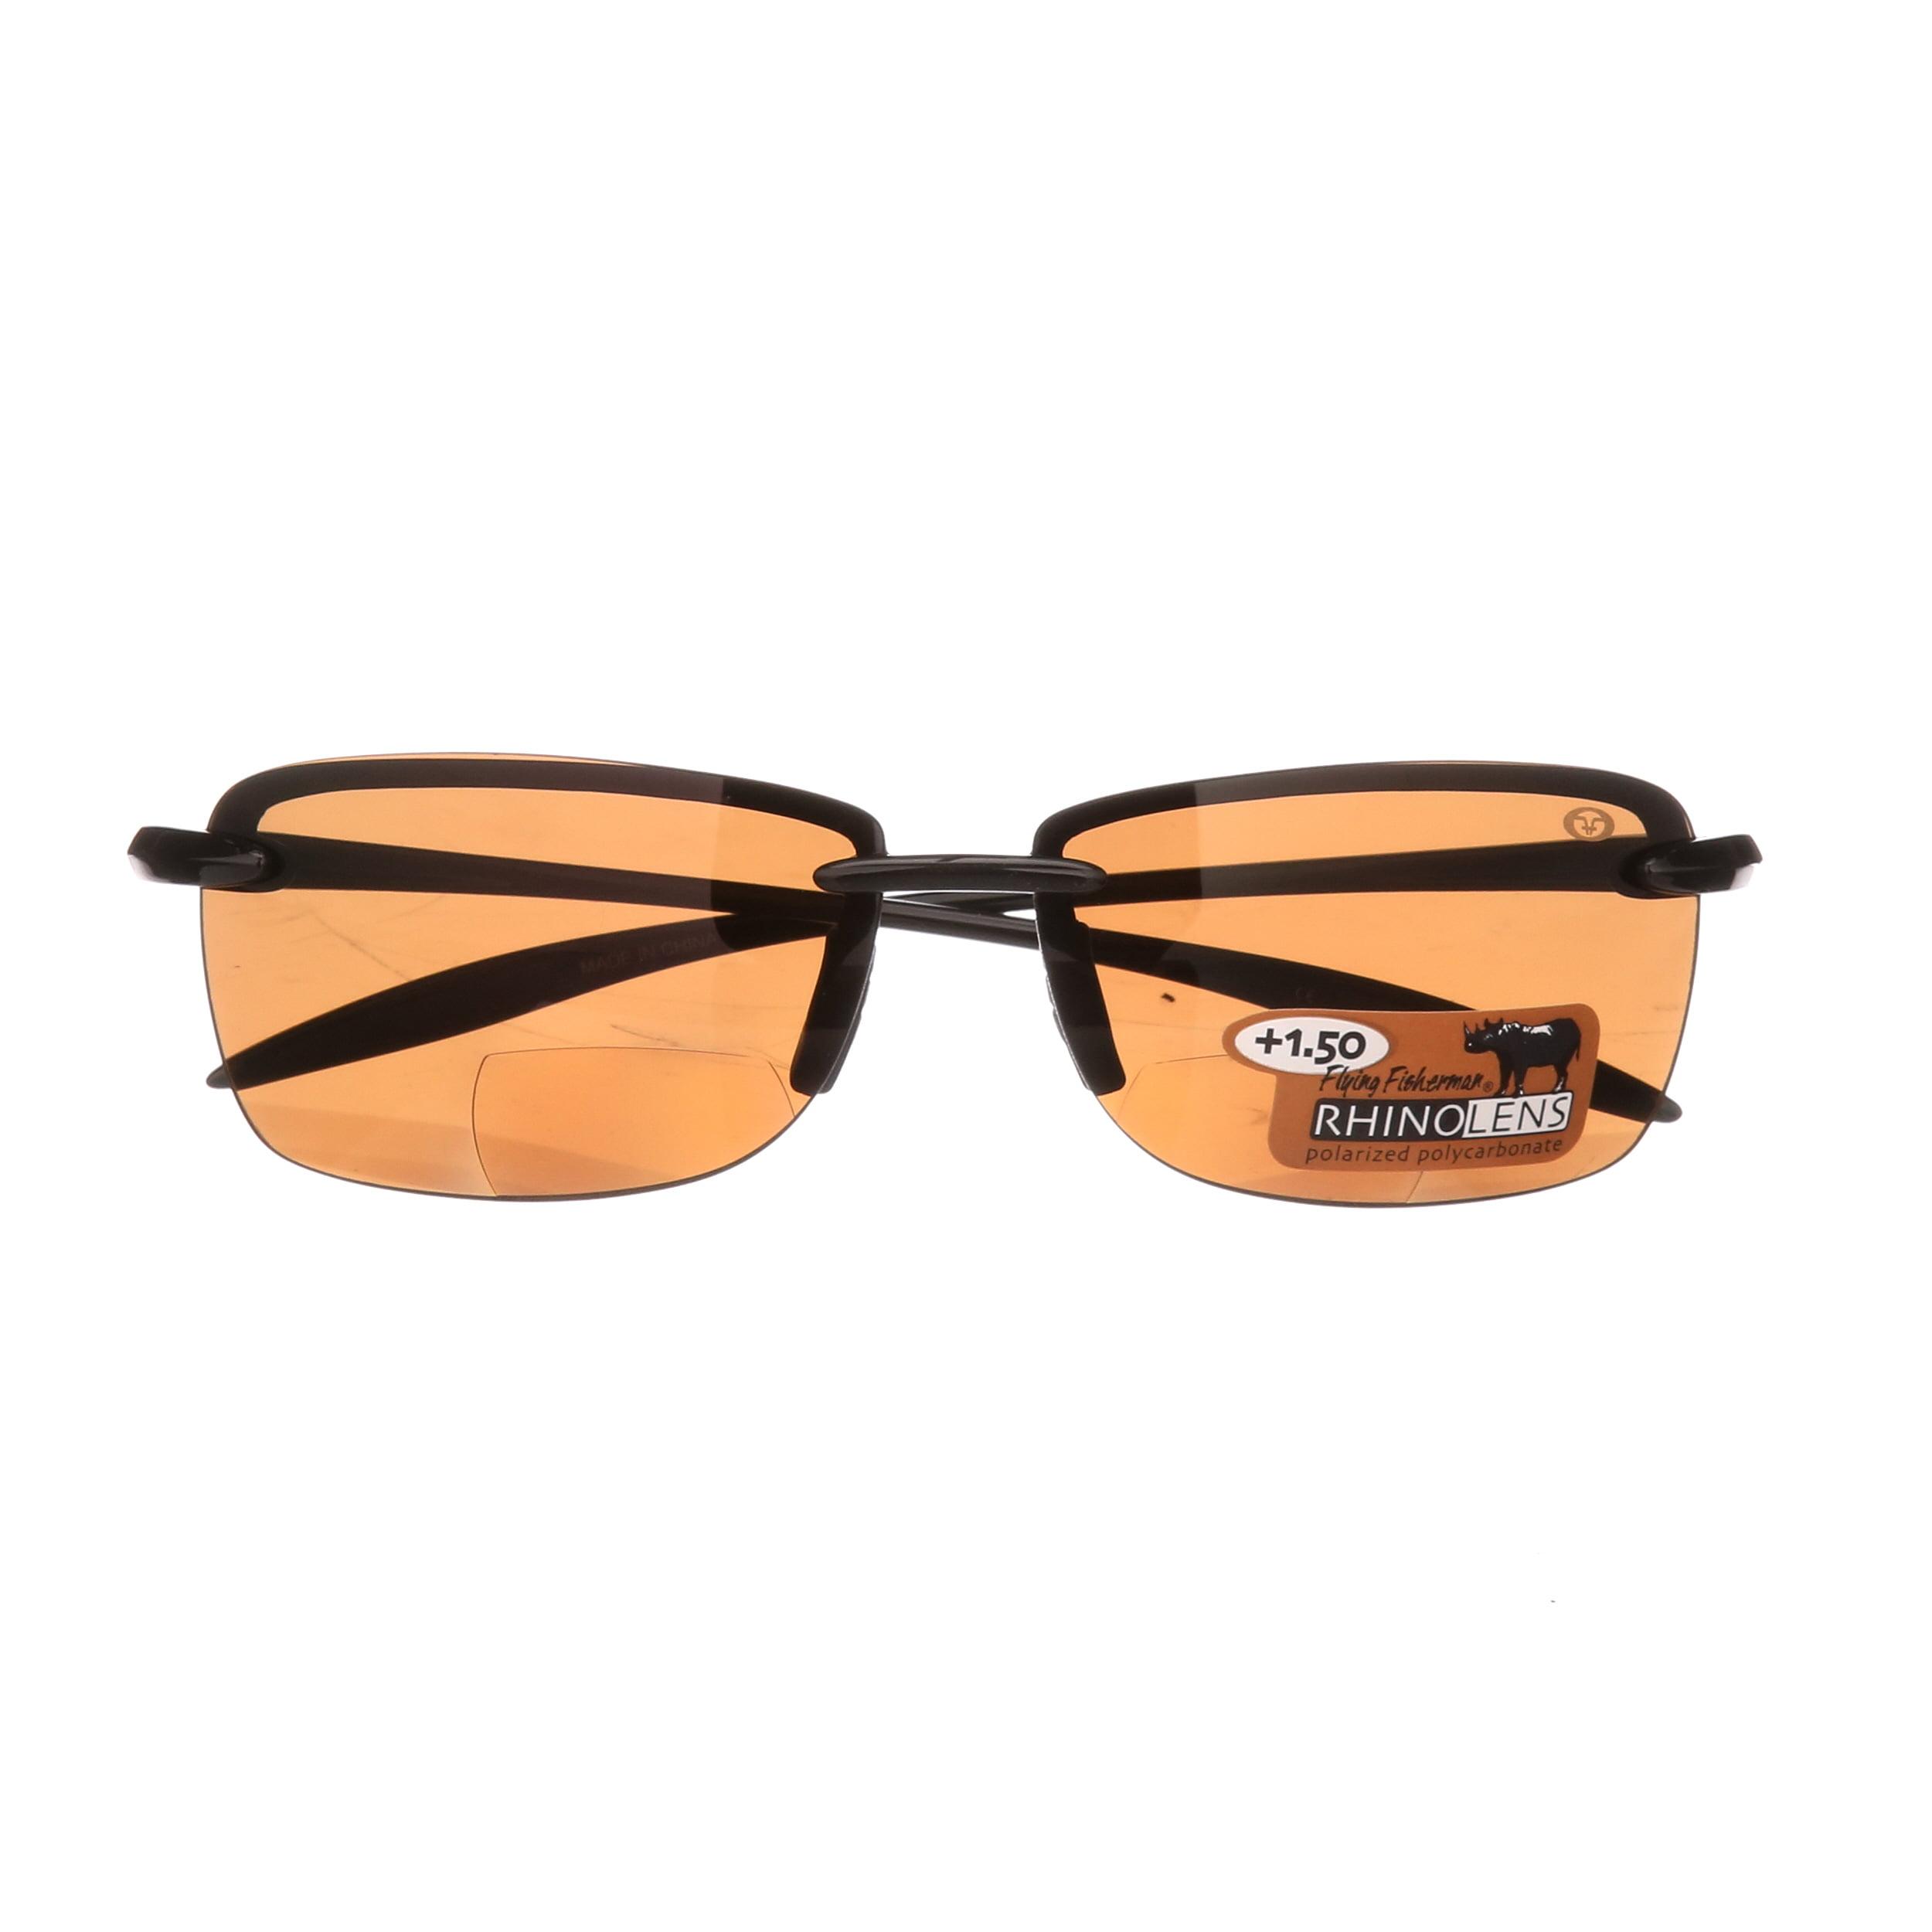 6a3883d1e15 Flying Fisherman Cali Polarized Sunglasses   Bifocal Reader - Walmart.com